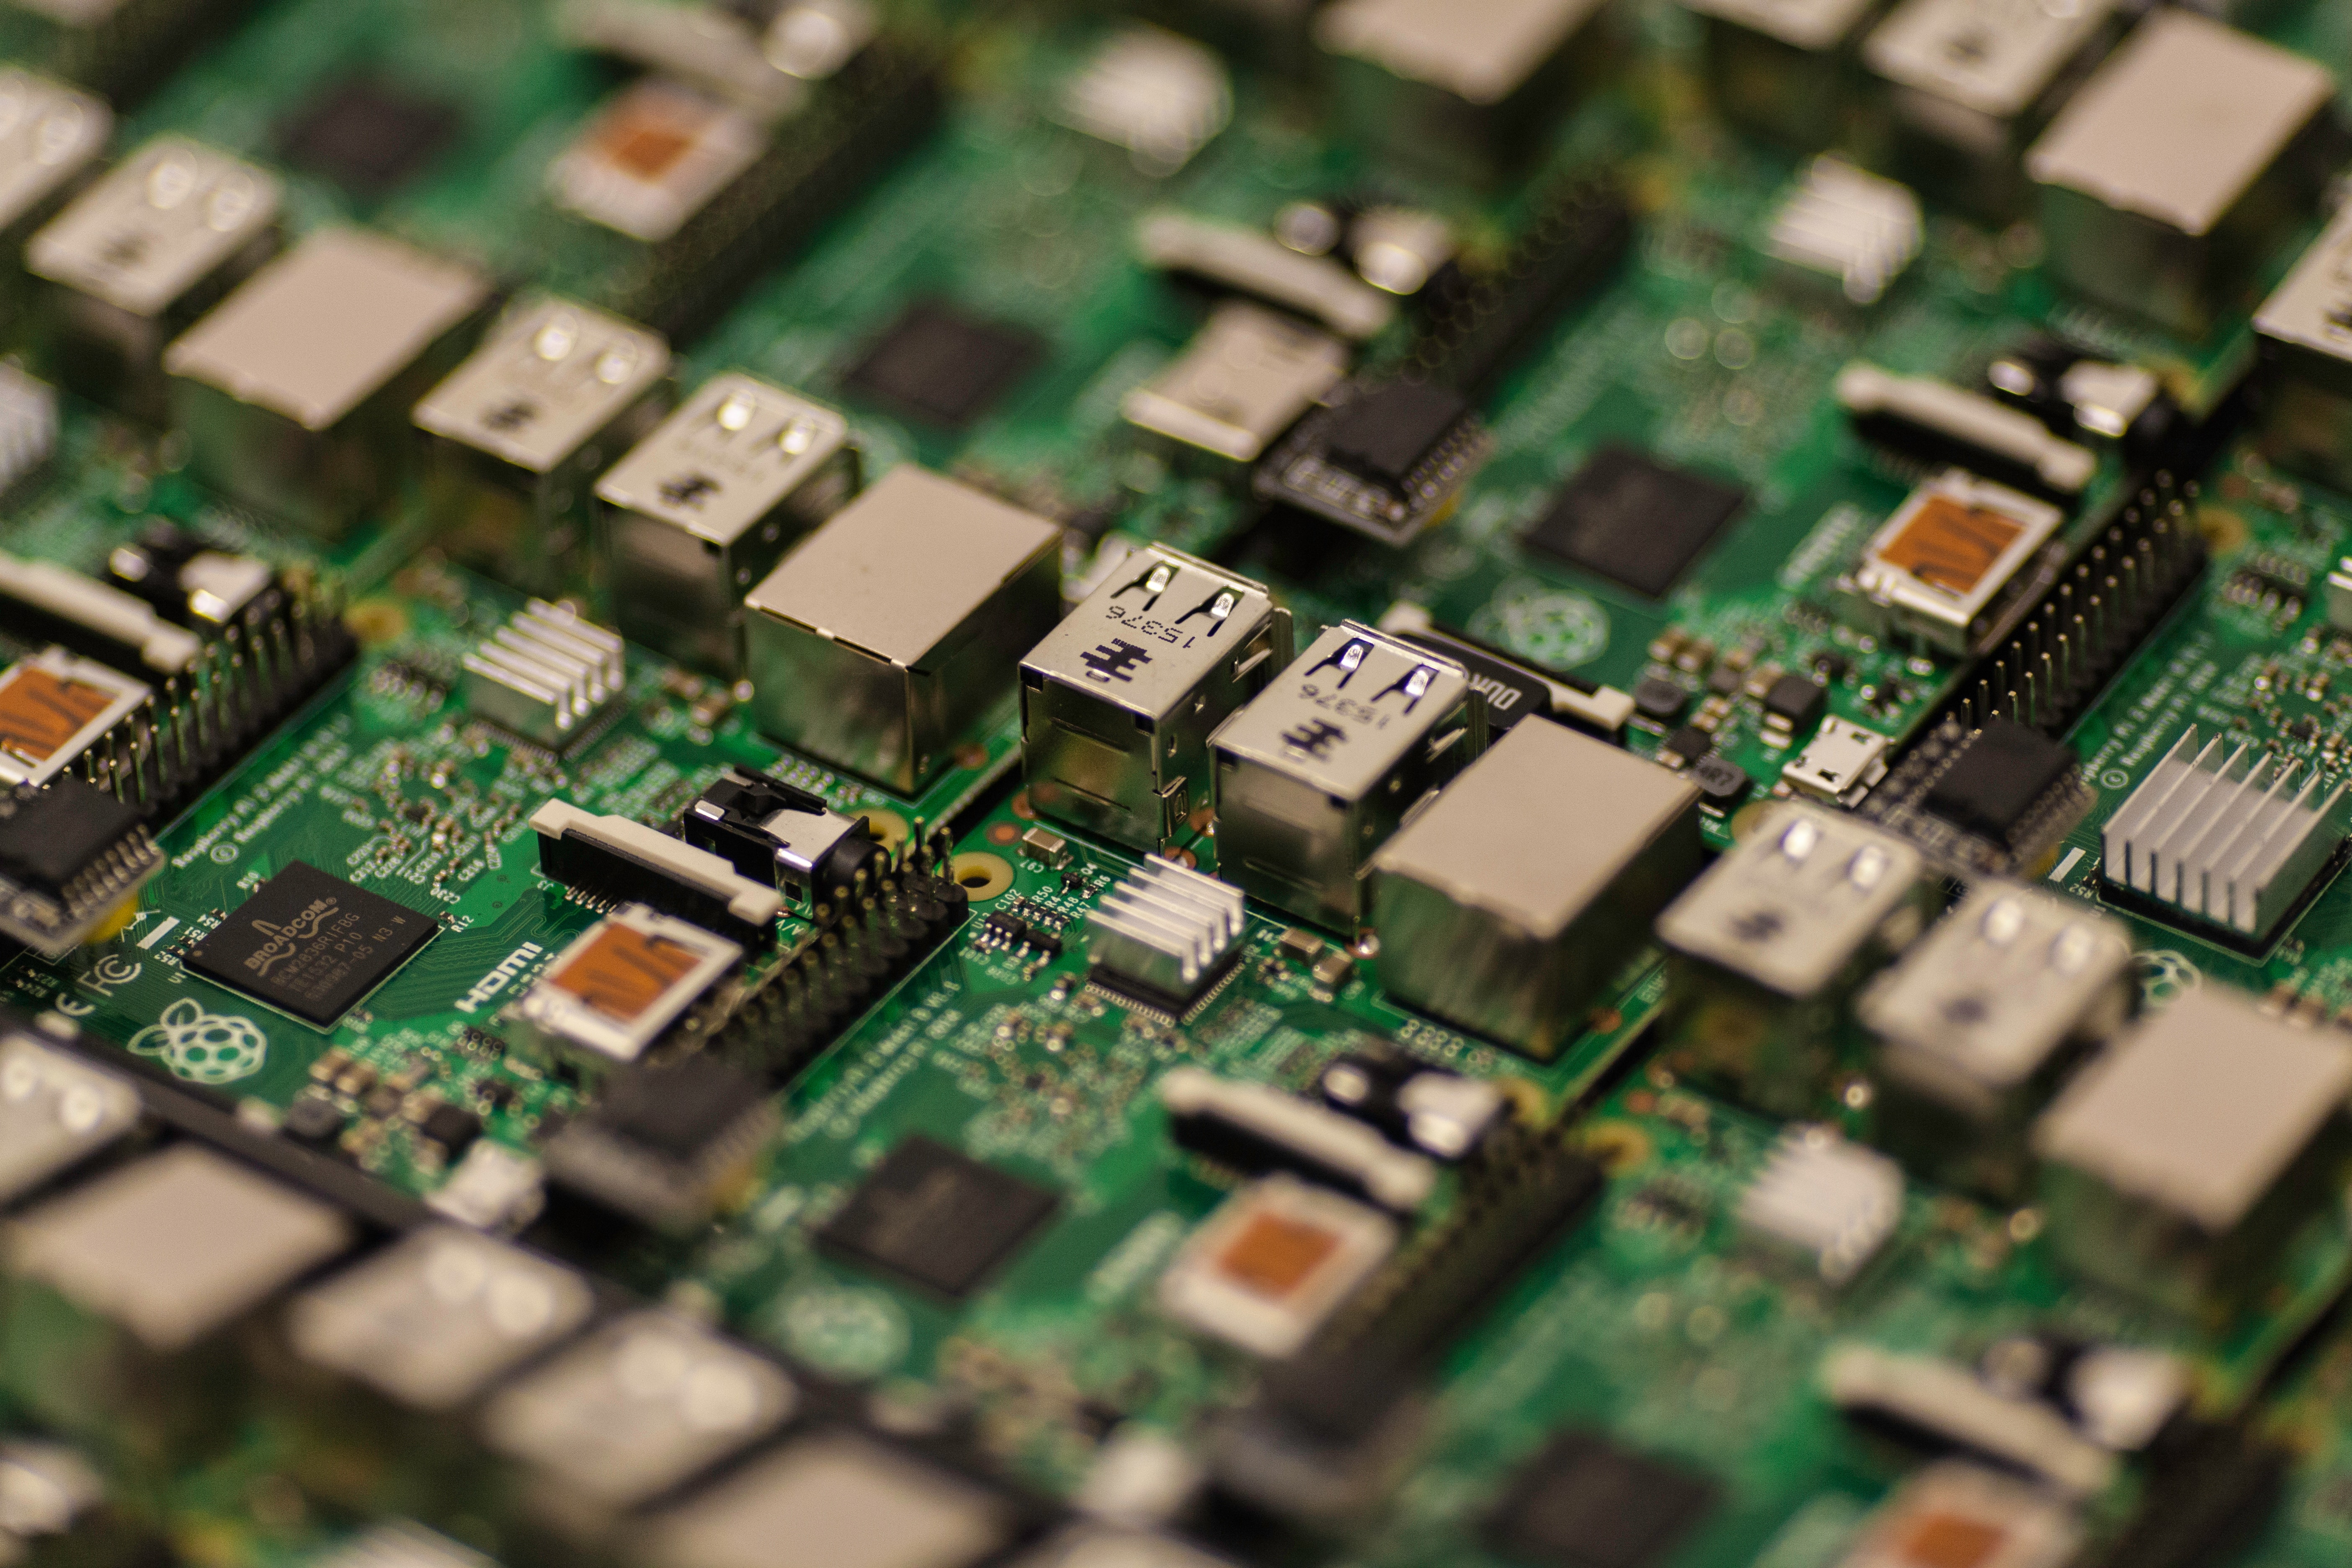 How to teach Raspberry to detect movement - Custom Web